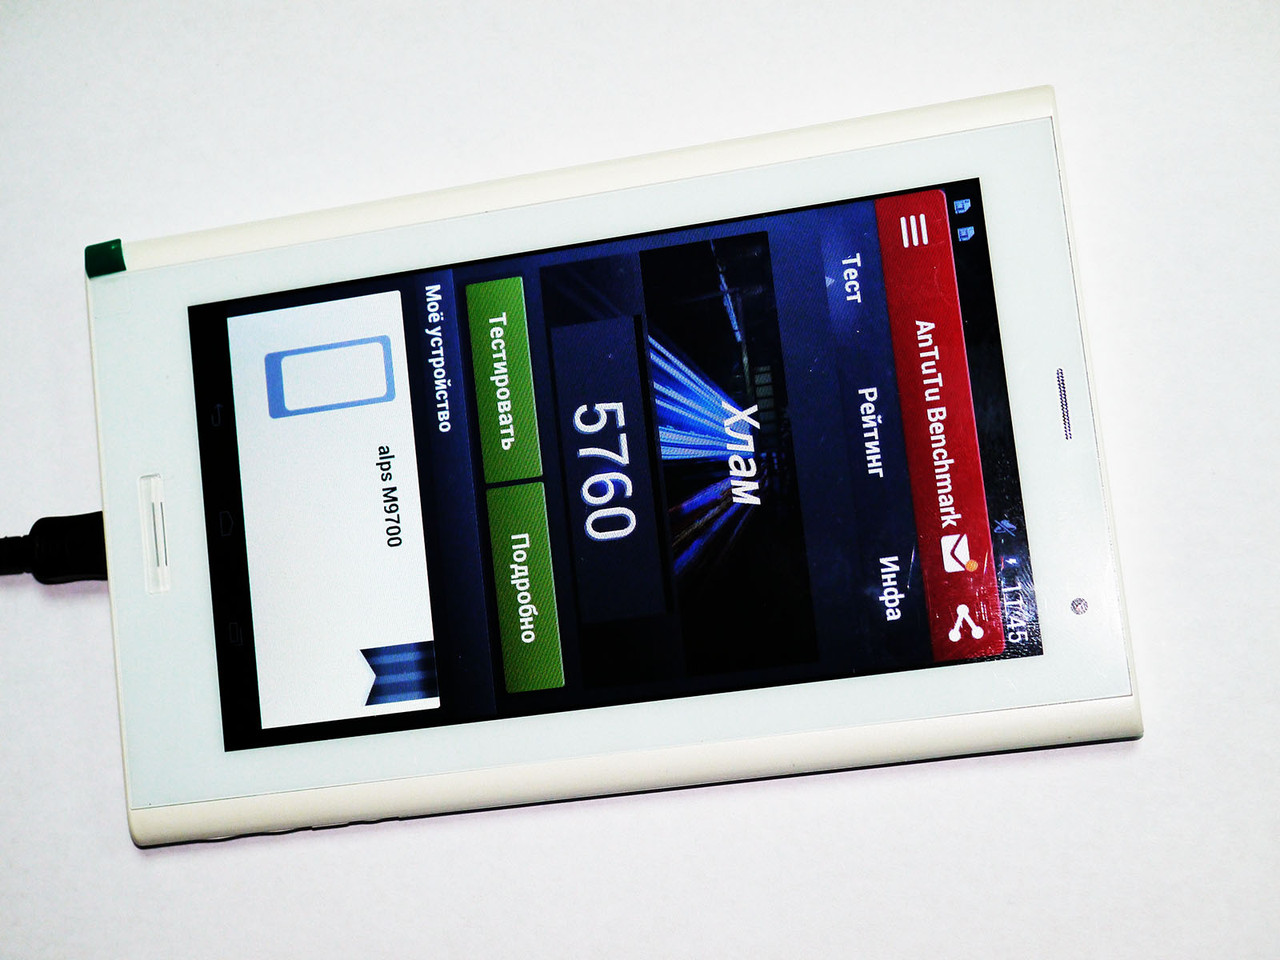 Планшет Samsung M9700 7 Android 4.2 GSM Tablet PC Wifi /SIM Bluetooth 2.0 FM TV